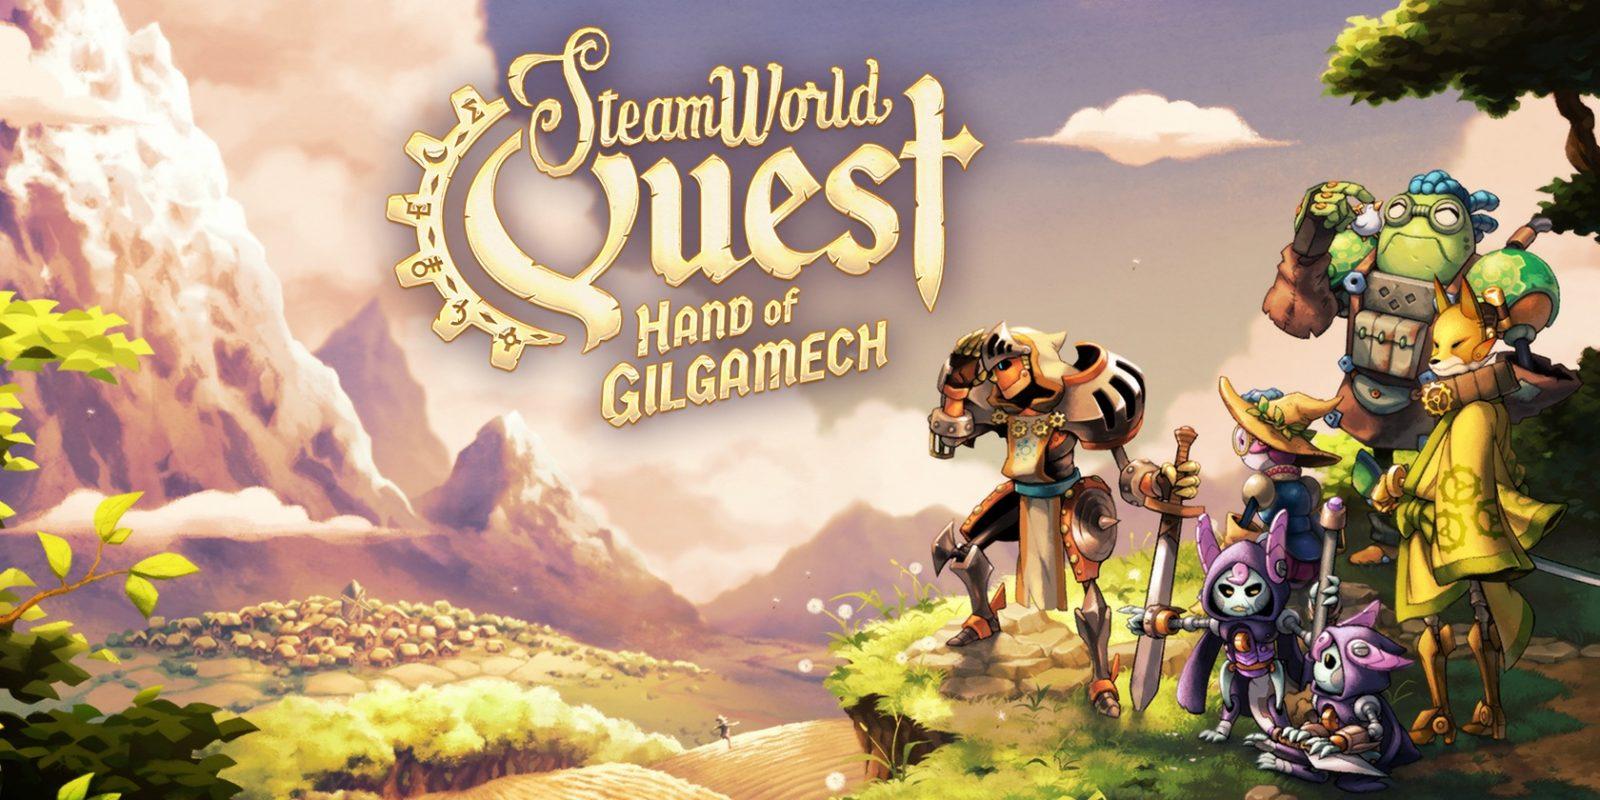 Switch eShop sale from $1: SteamWorld Quest, Brothers, Wonder Boy